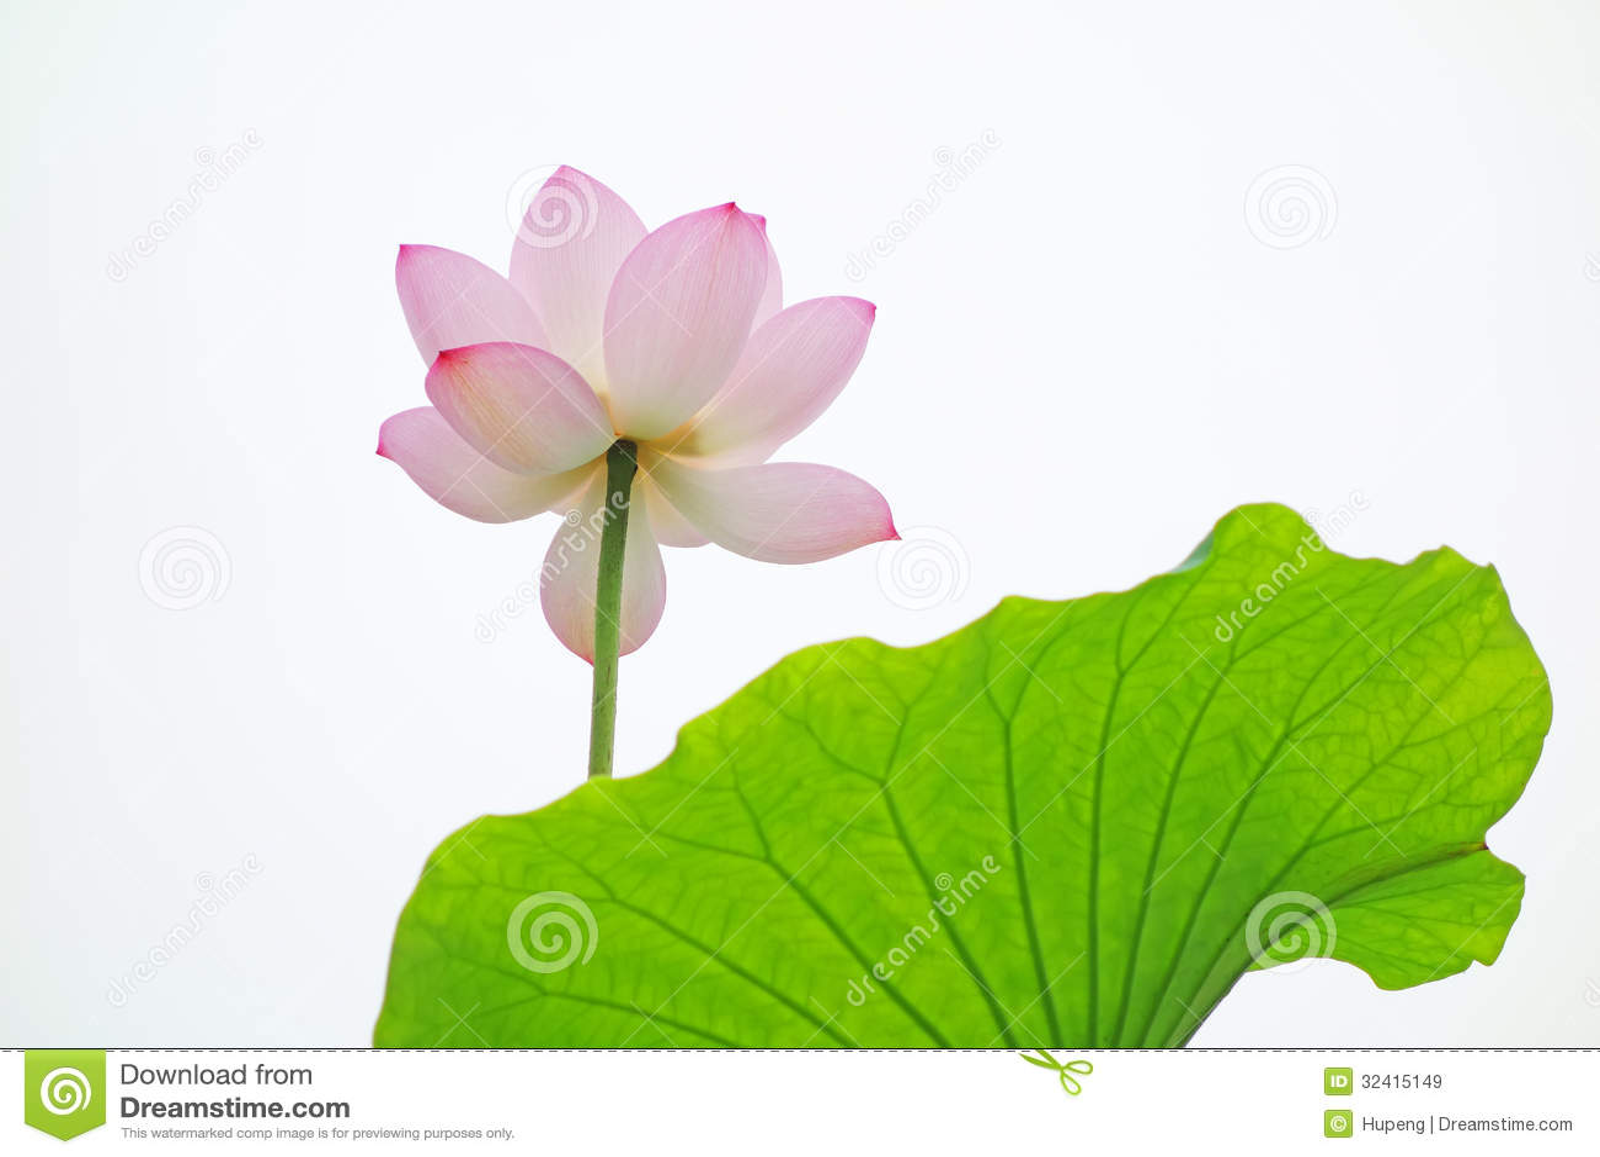 Pink lotus flower on the white background stock image image of pink lotus flower on the white background izmirmasajfo